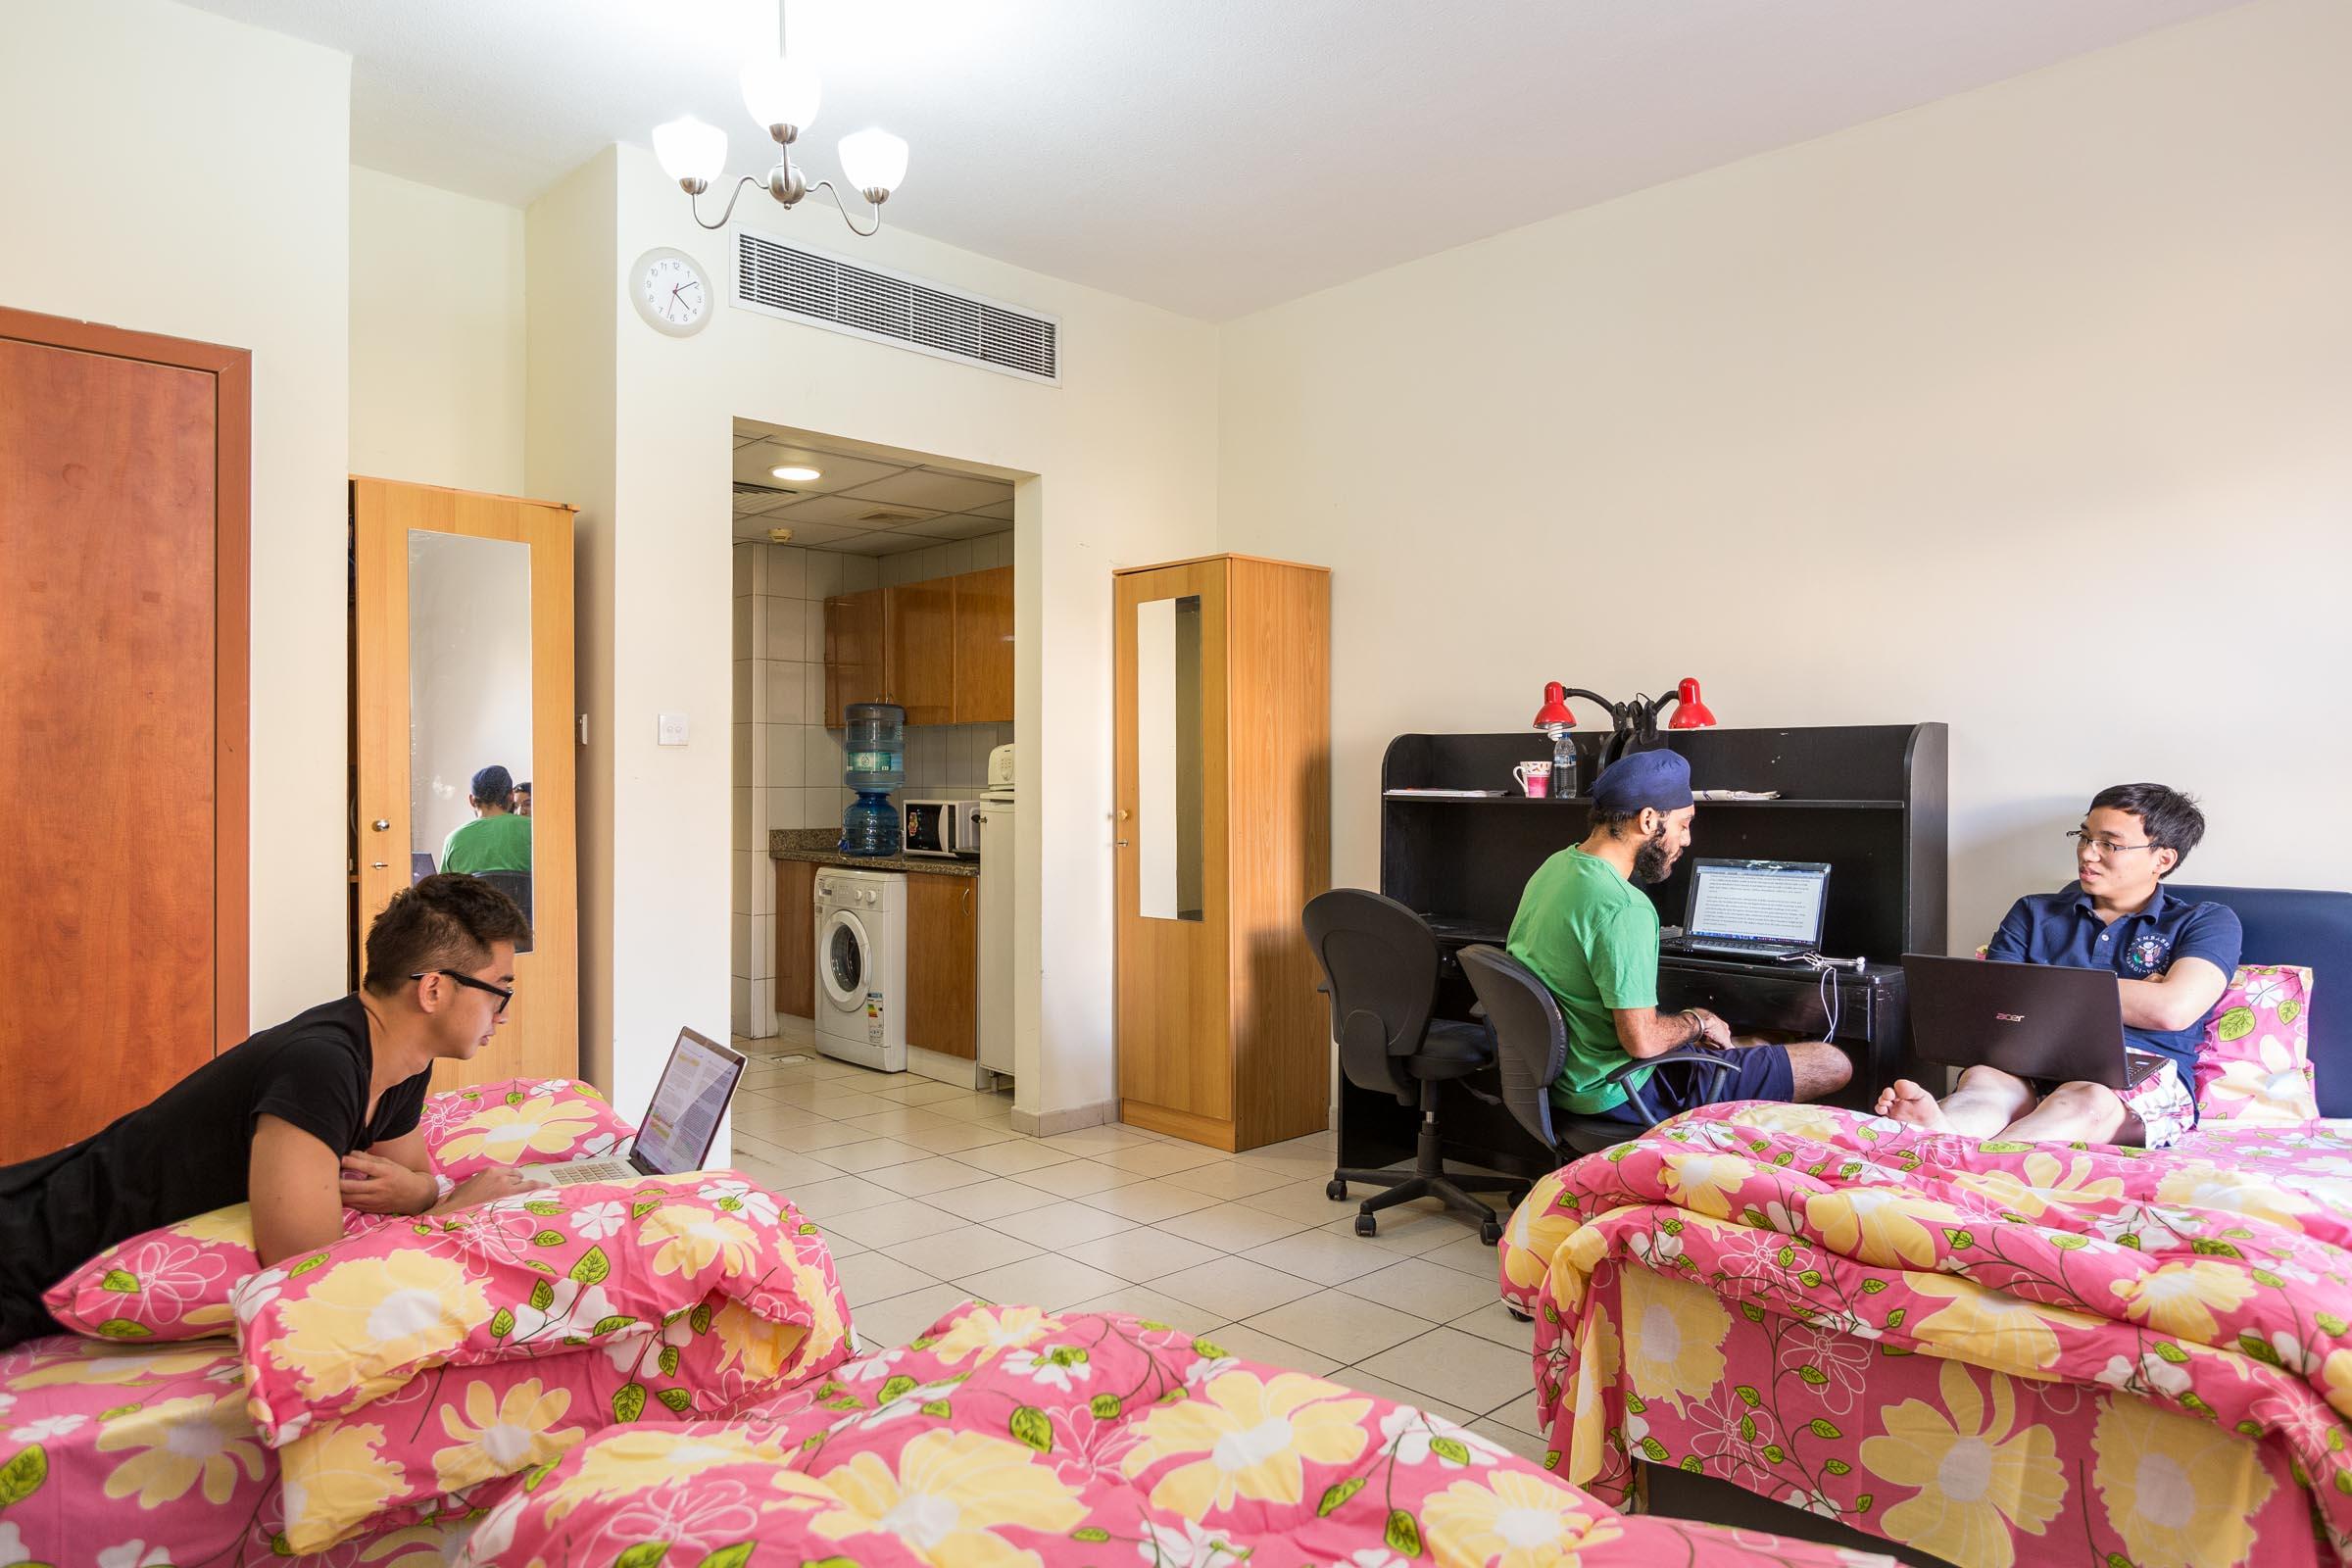 Dubai_accommodation_bedroom.jpg